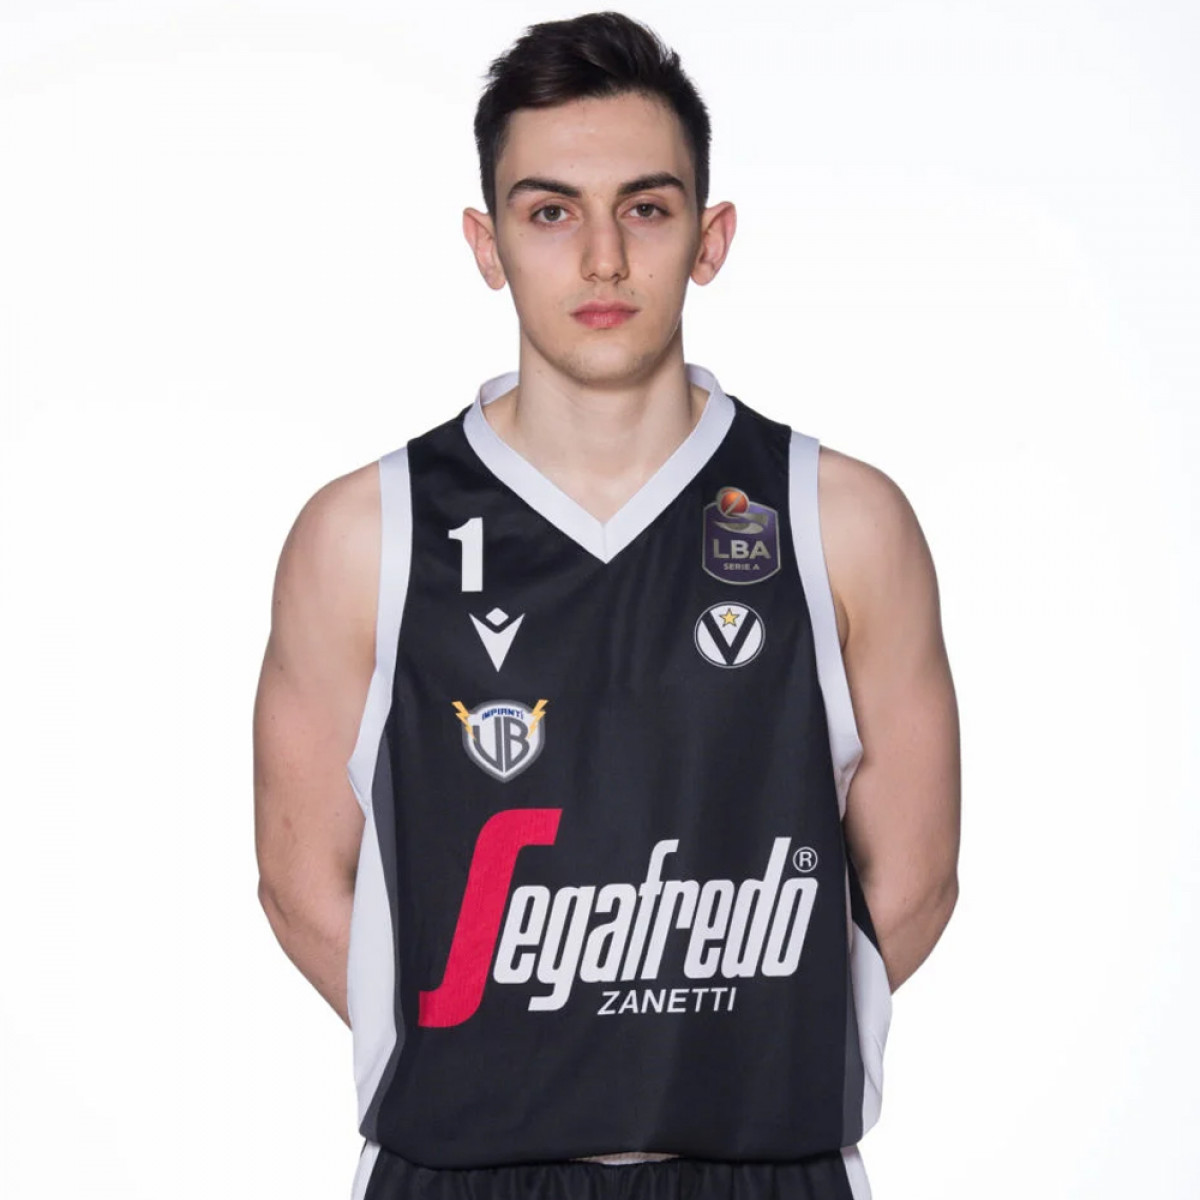 Photo of Lorenzo Deri, 2019-2020 season